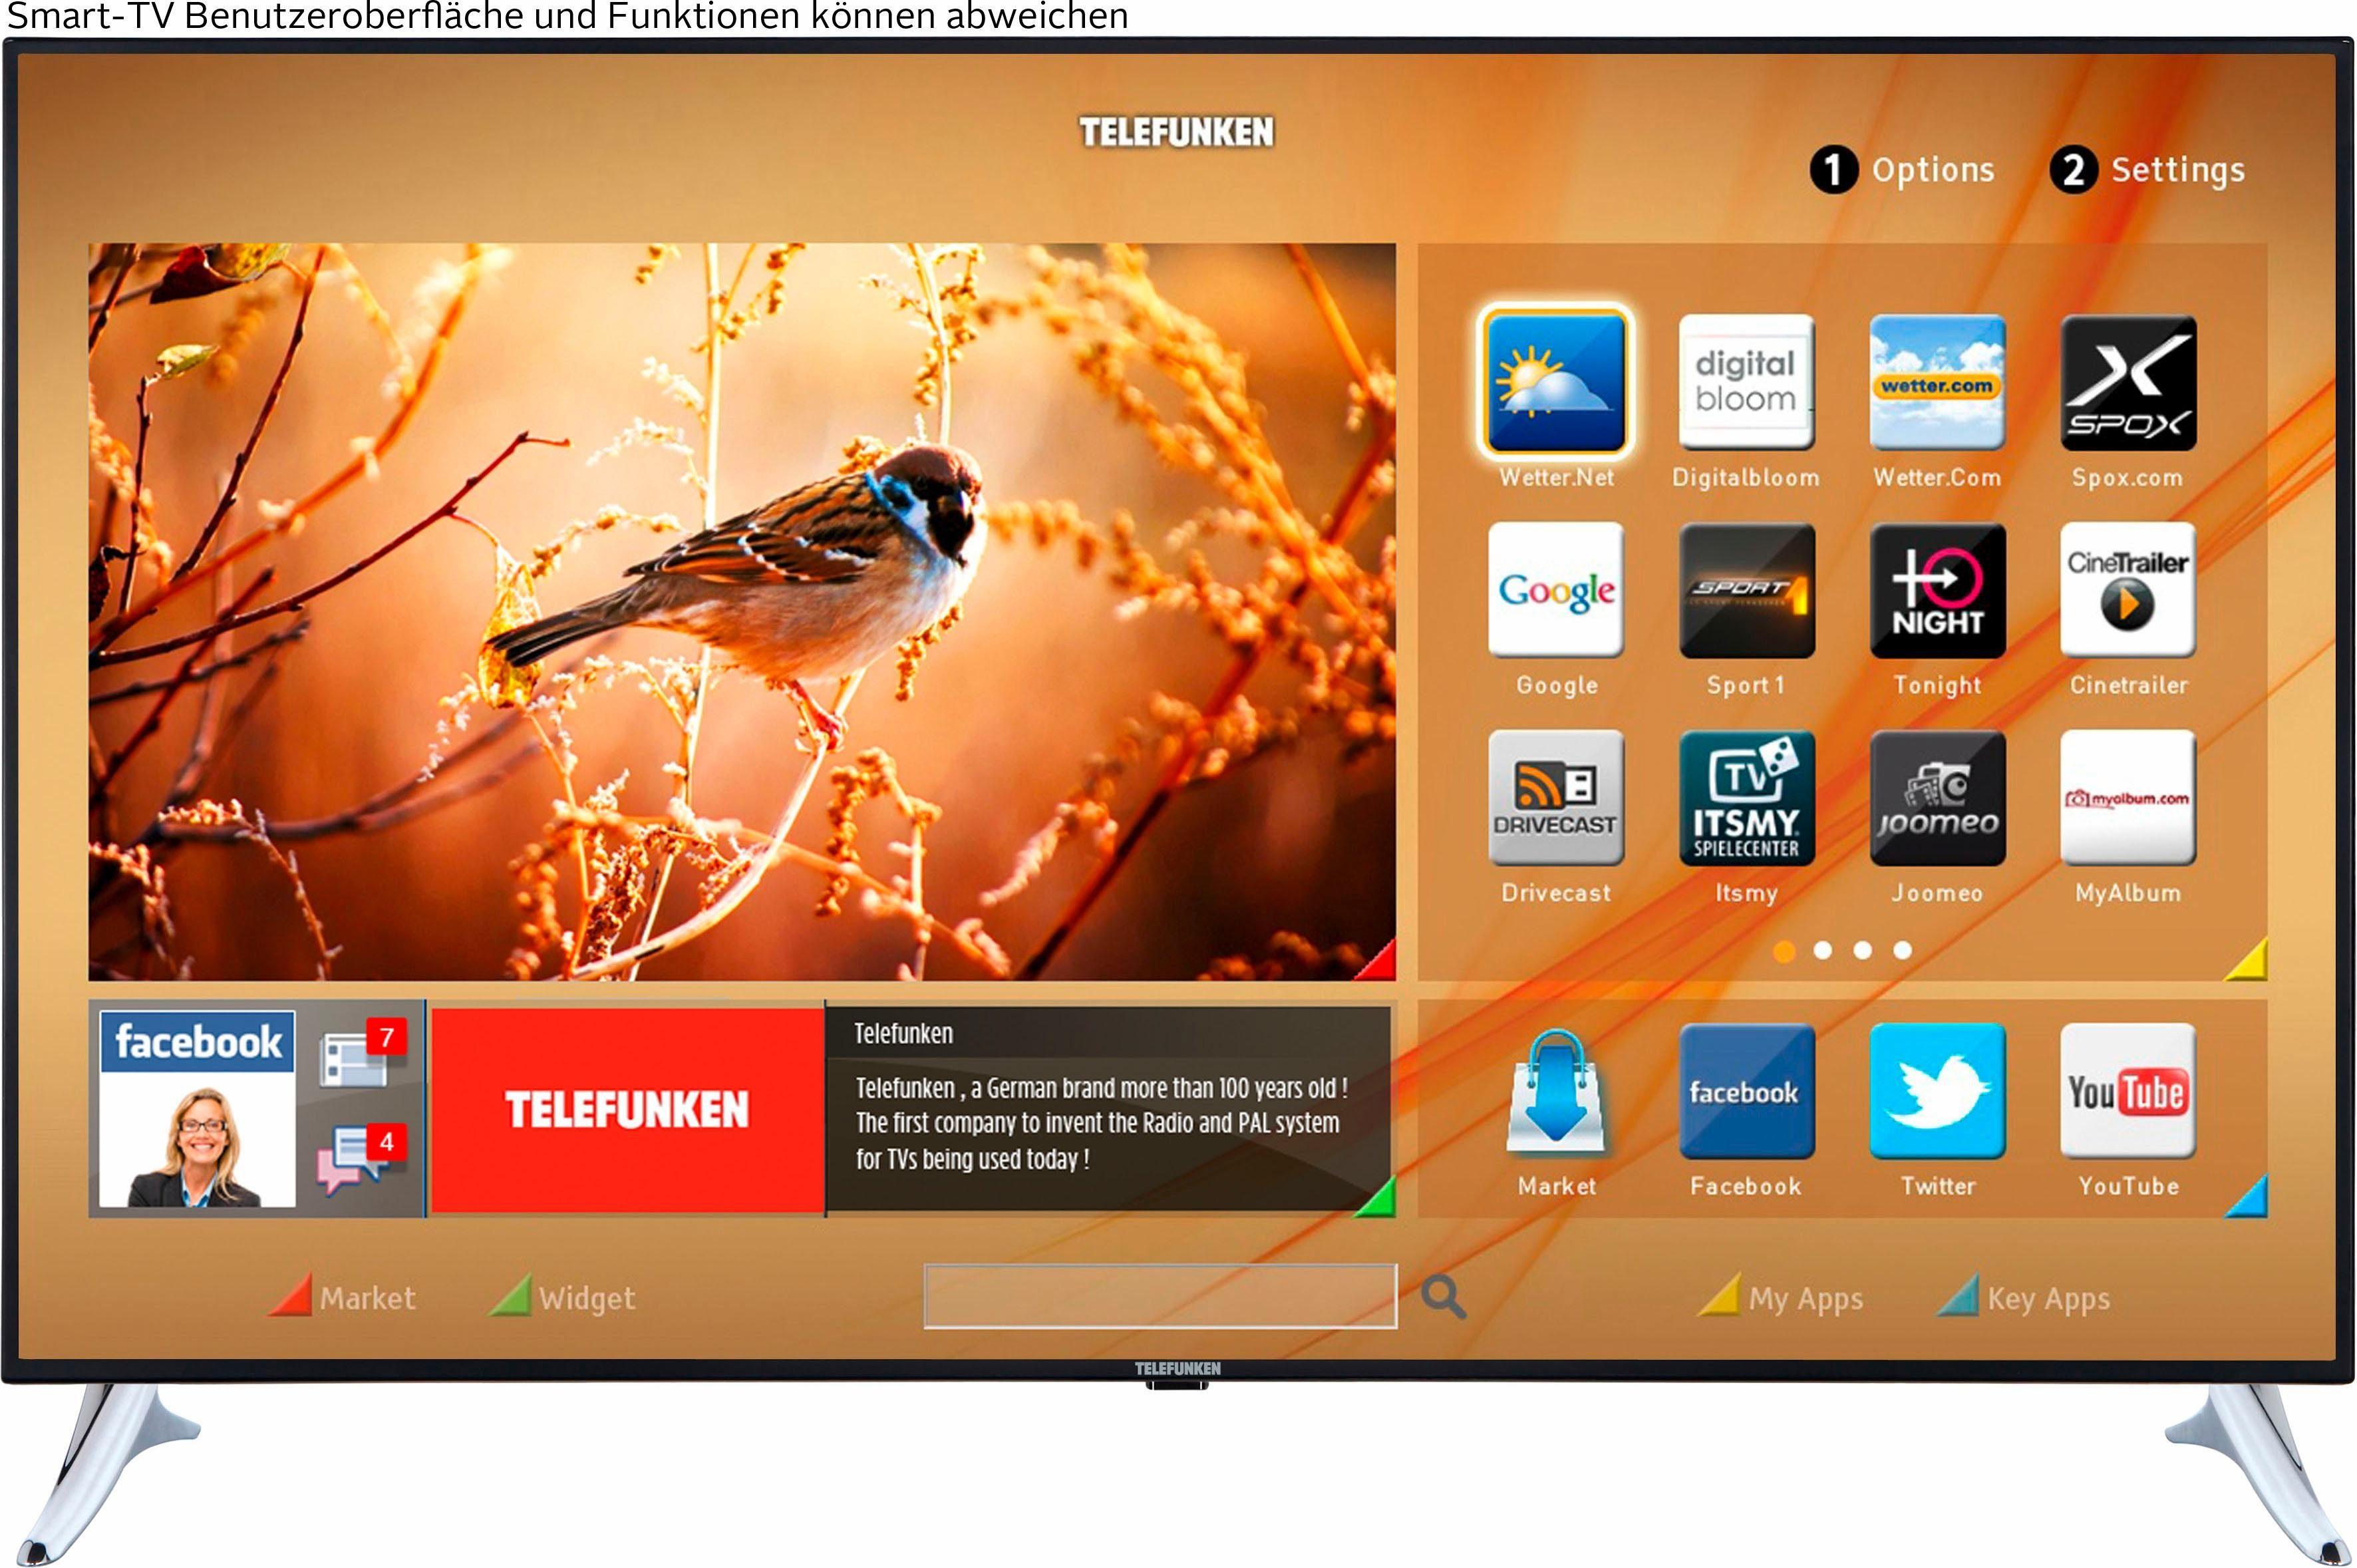 Telefunken L65U549M4CW, LED Fernseher, 165 cm (65 Zoll), 2160p (4K Ultra HD), Smart-TV